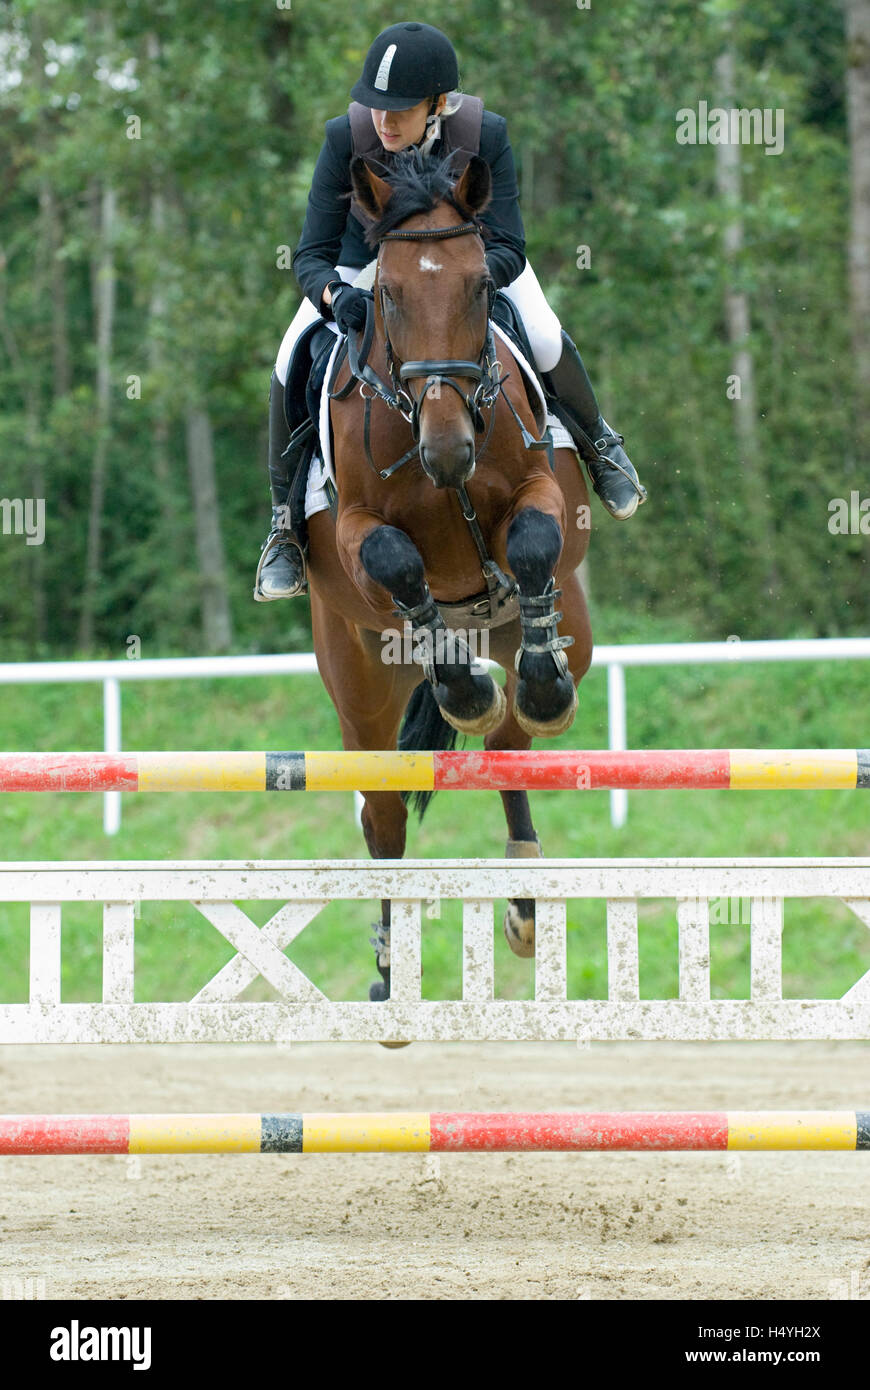 Showjumping, anniversary event of rural riders in Stadl Paura, Upper Austria, Austria, Europe - Stock Image